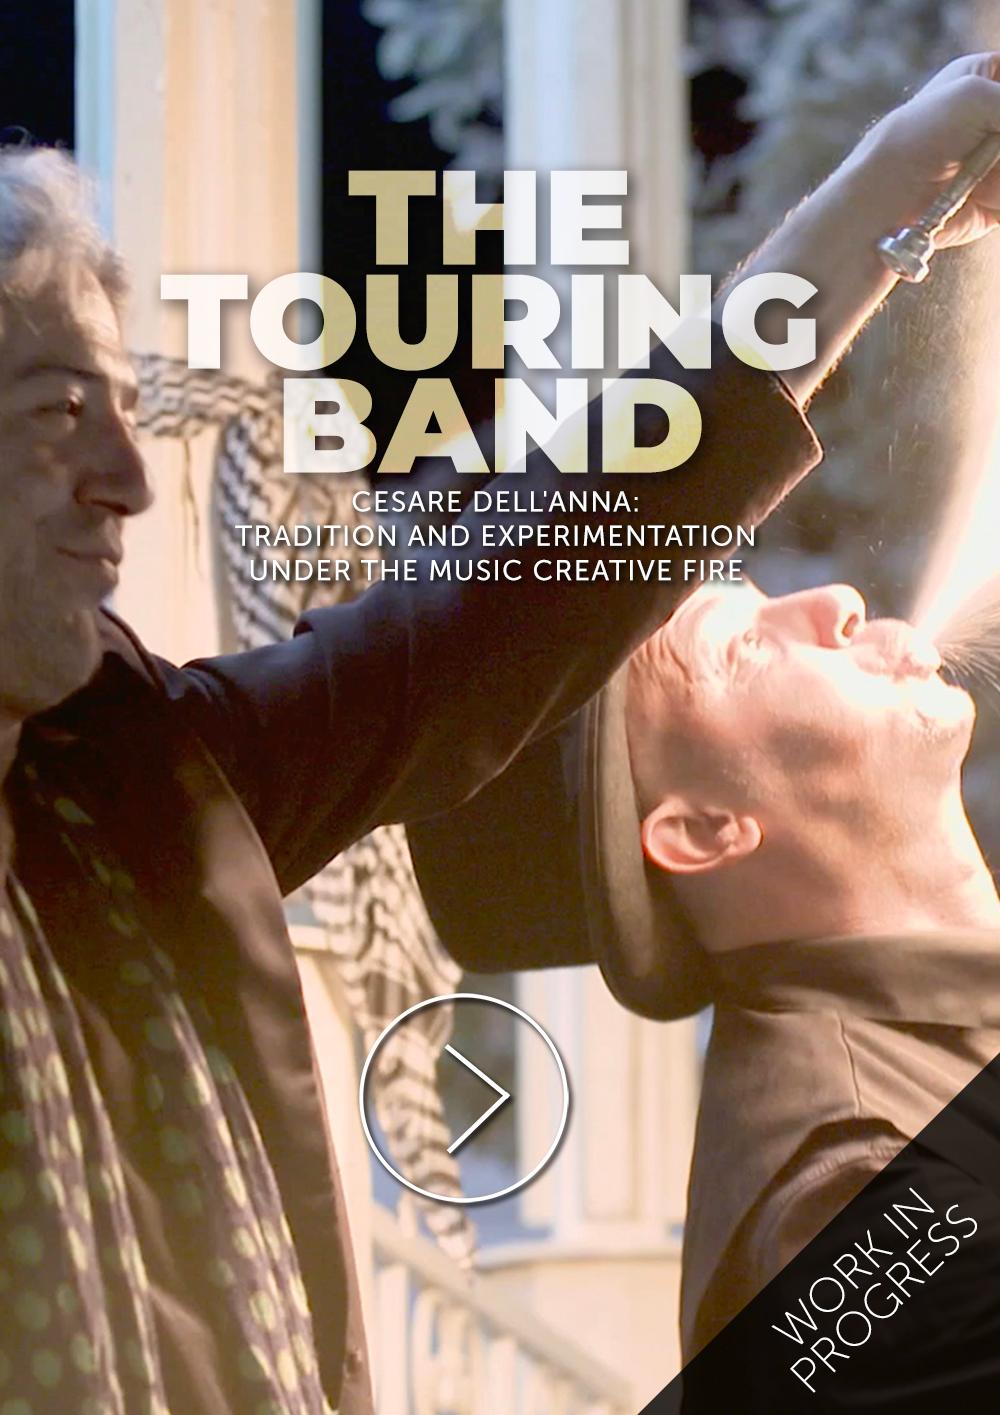 The Touring Band Talpa Produzioni